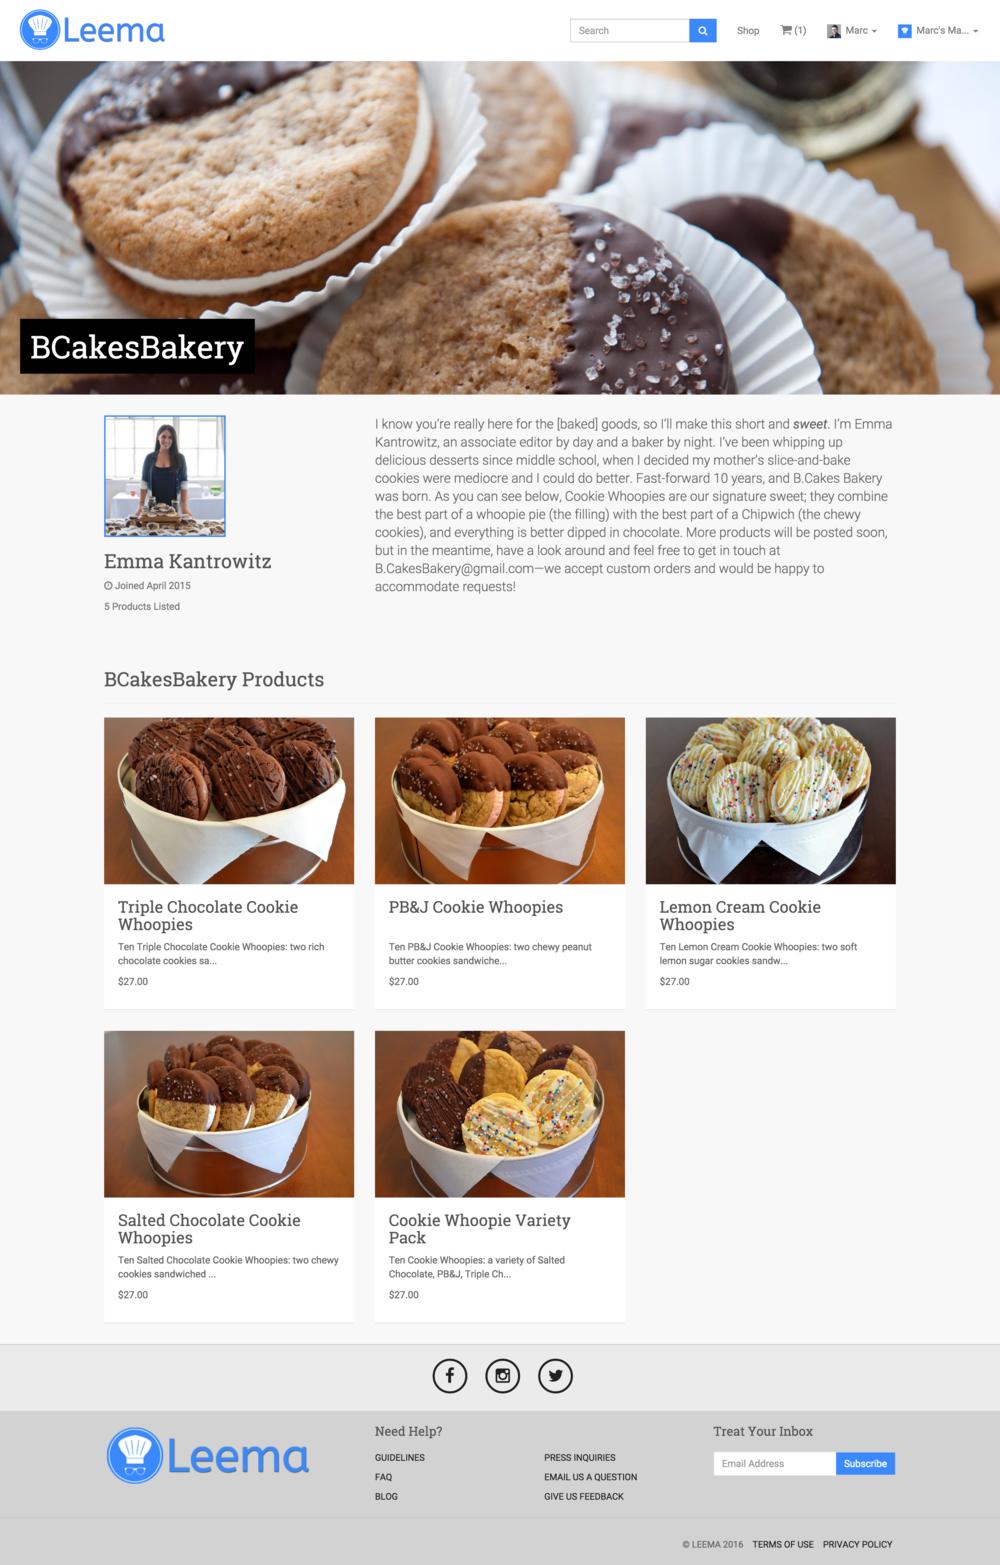 screencapture-www-leemaeats-com-bcakesbakery-1453230155204-1.png